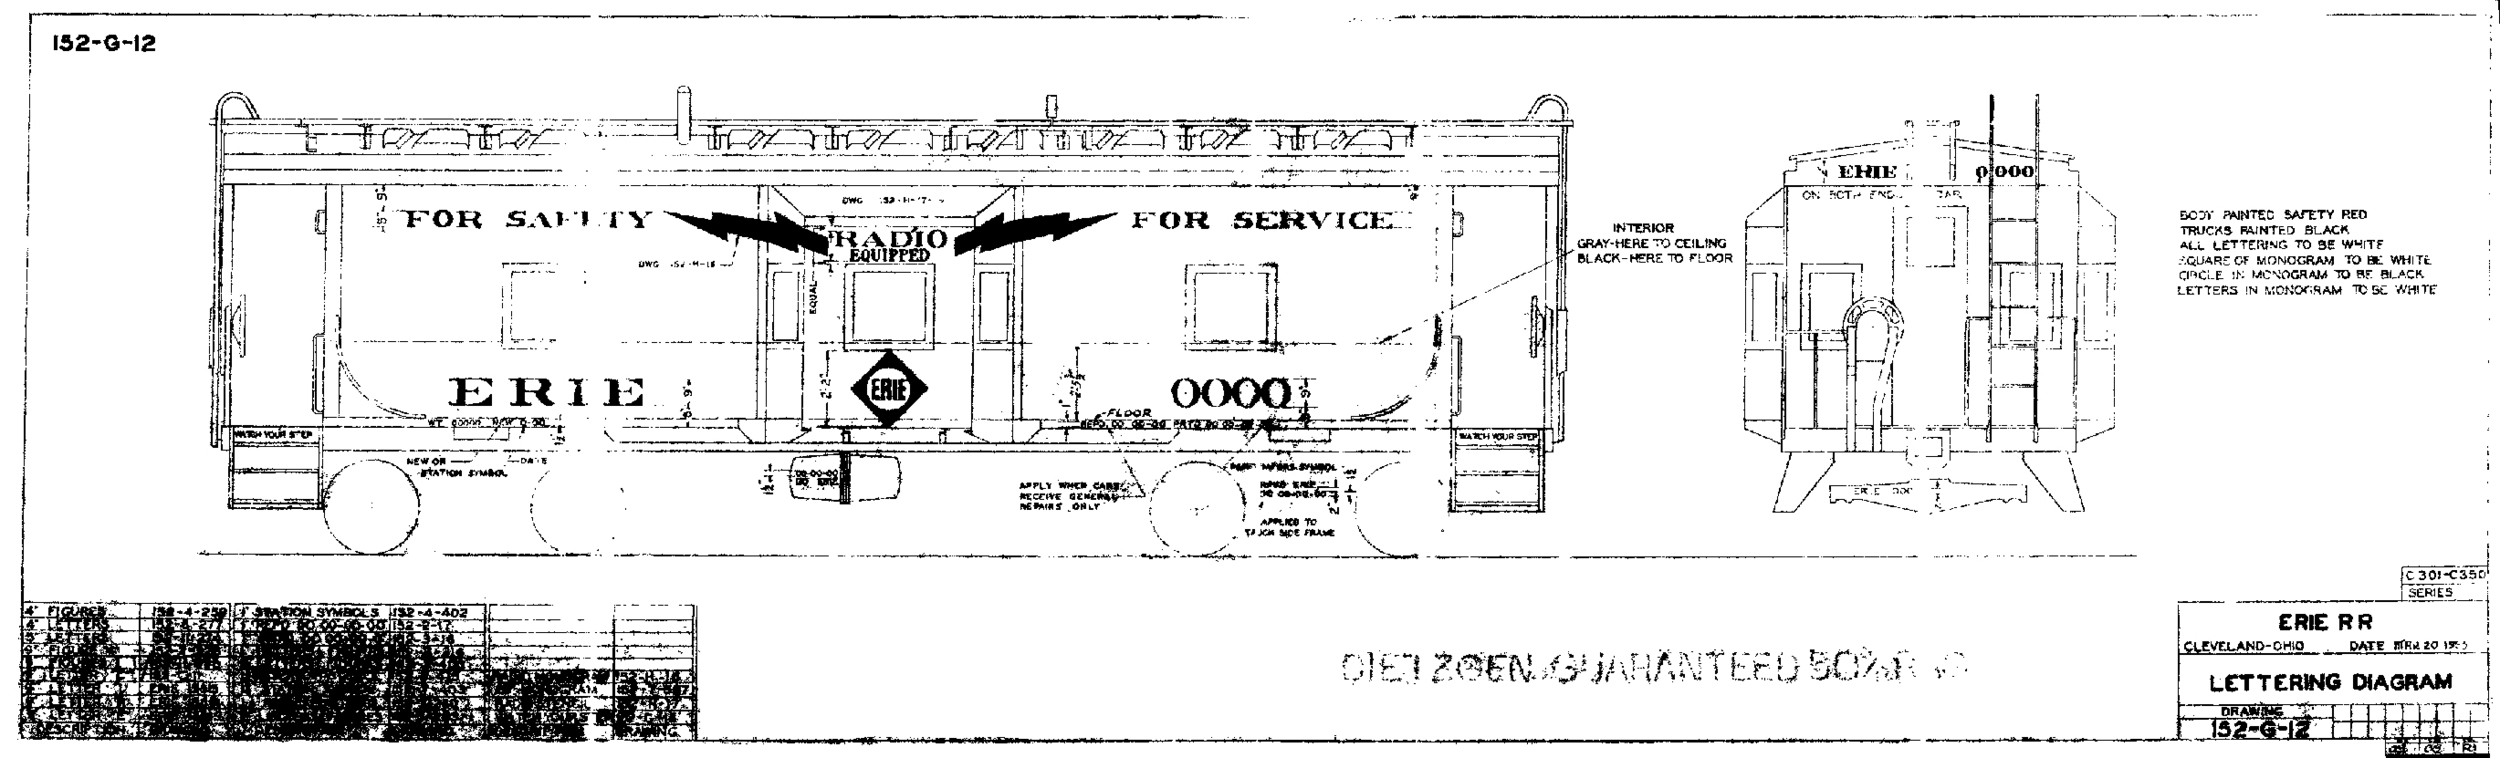 Paint diagram for cabooses Nos. C301-C350.  (Paul Tupaczewski collection)